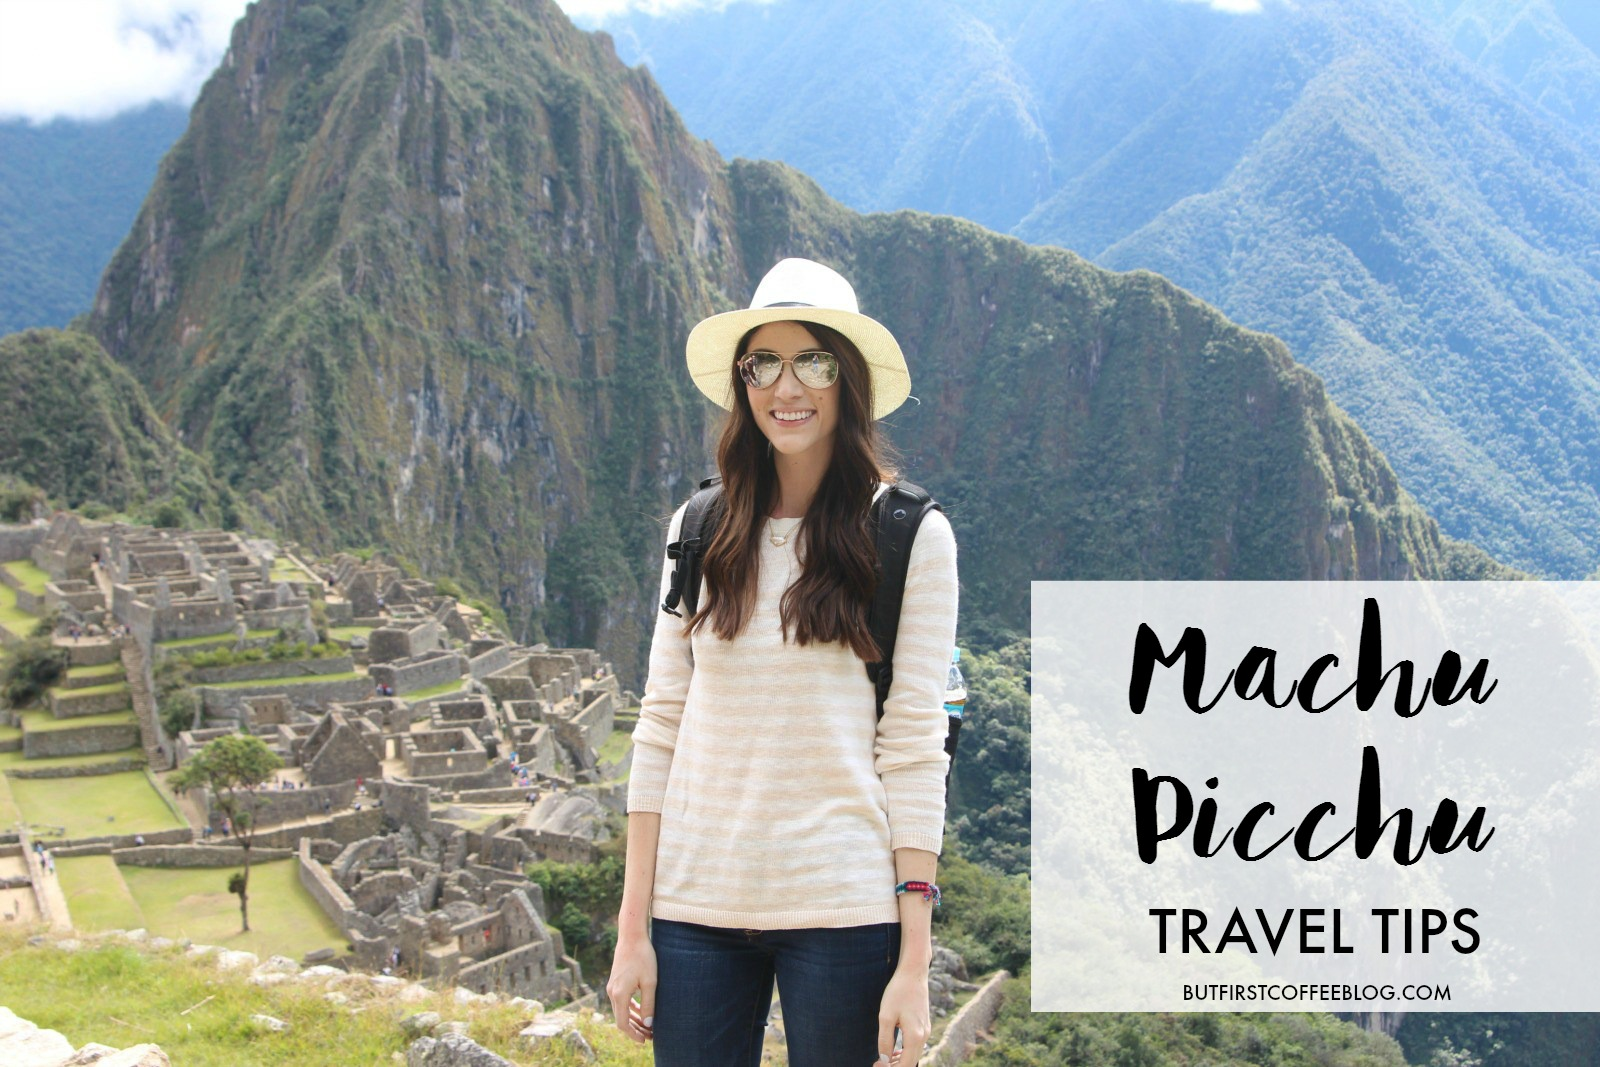 macchu-picchu-travel-tips